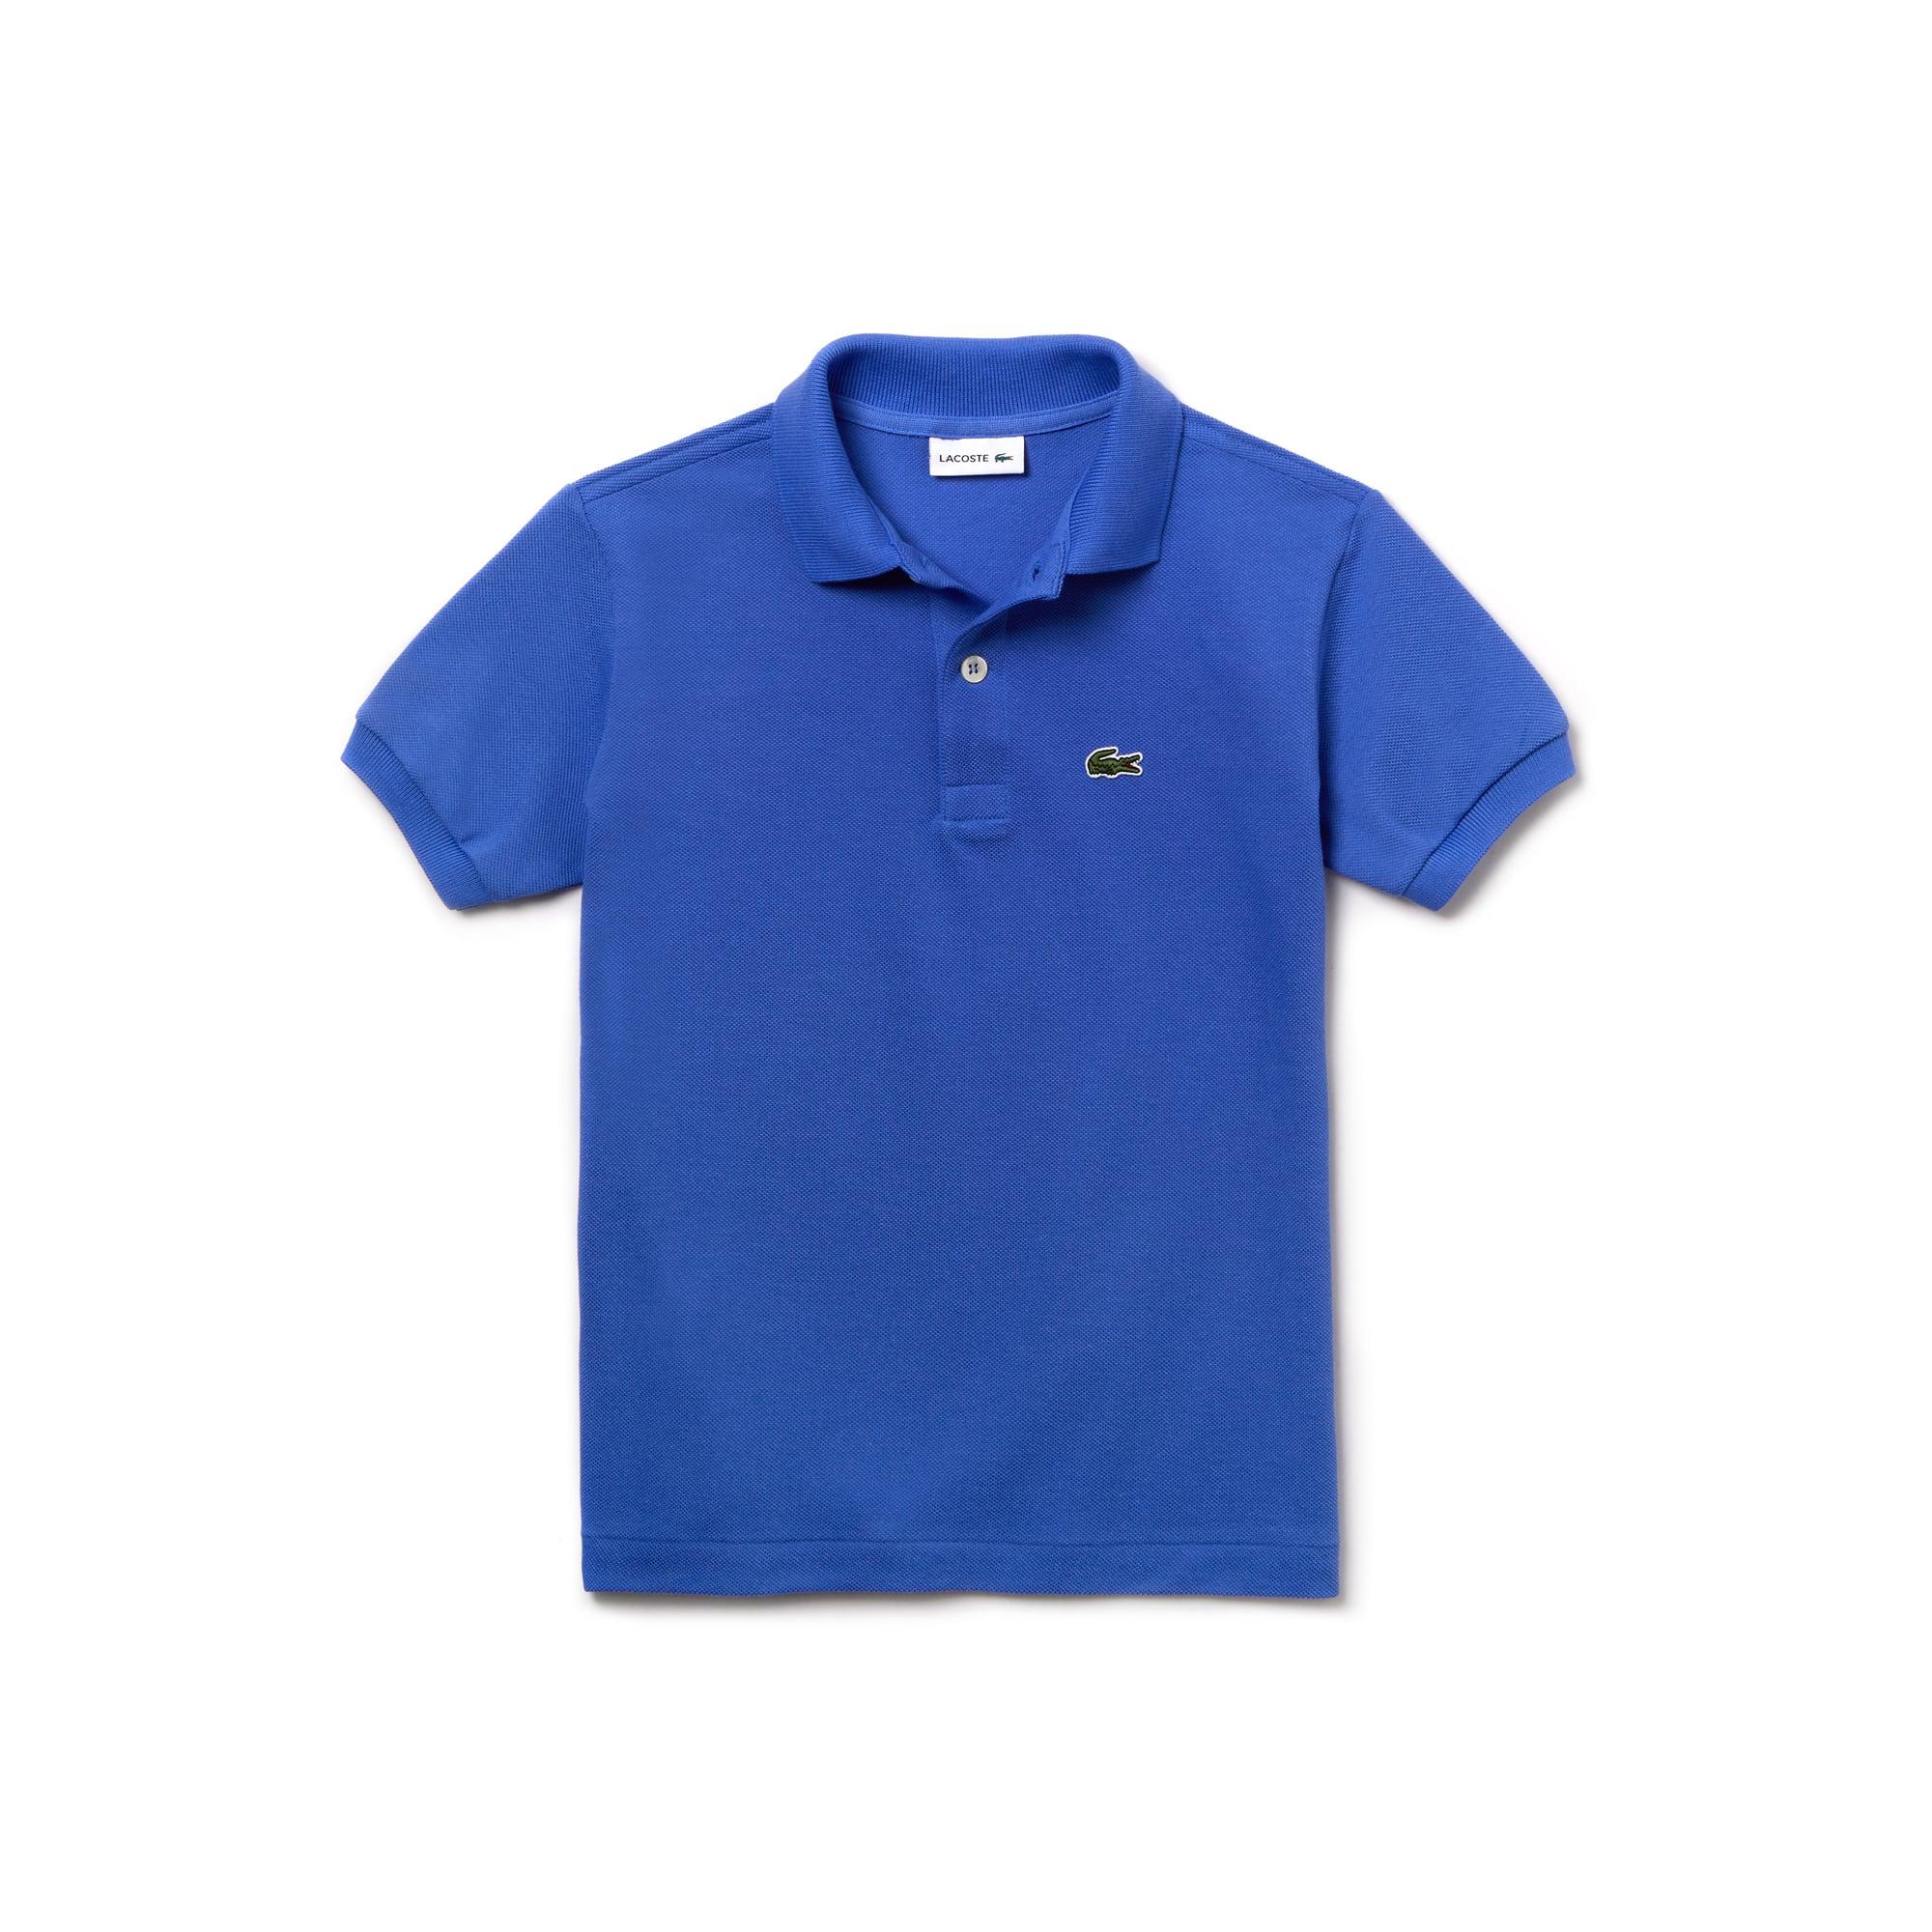 c64653db48 Boy's Clothing | Kid's Clothing | LACOSTE